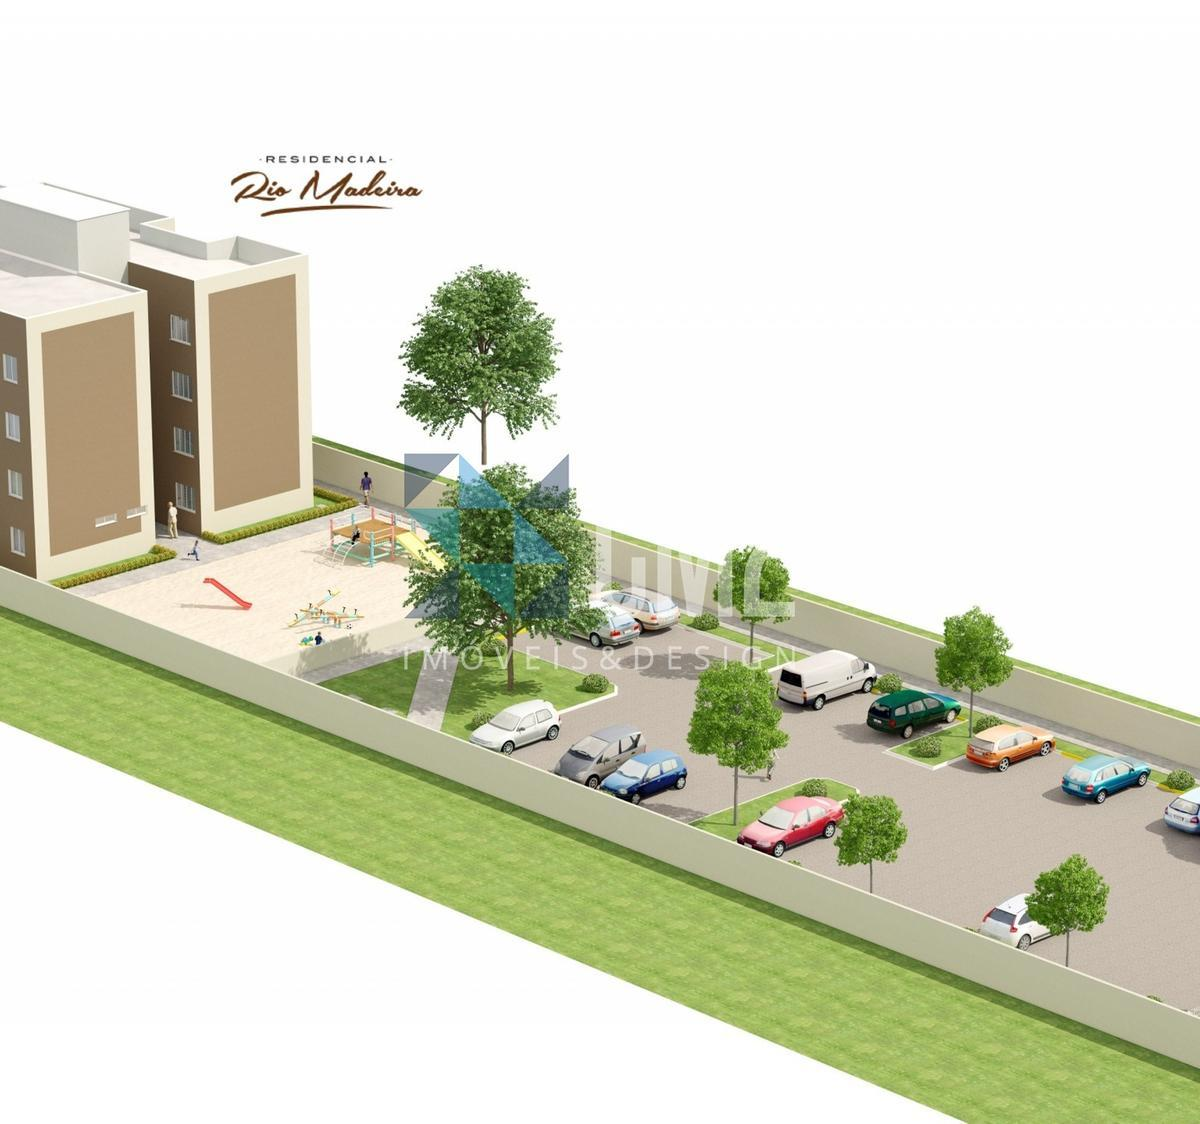 http://www.infocenterhost2.com.br/crm/fotosimovel/275507/79156398-apartamento-colombo-vila-maria-do-rosario.jpg